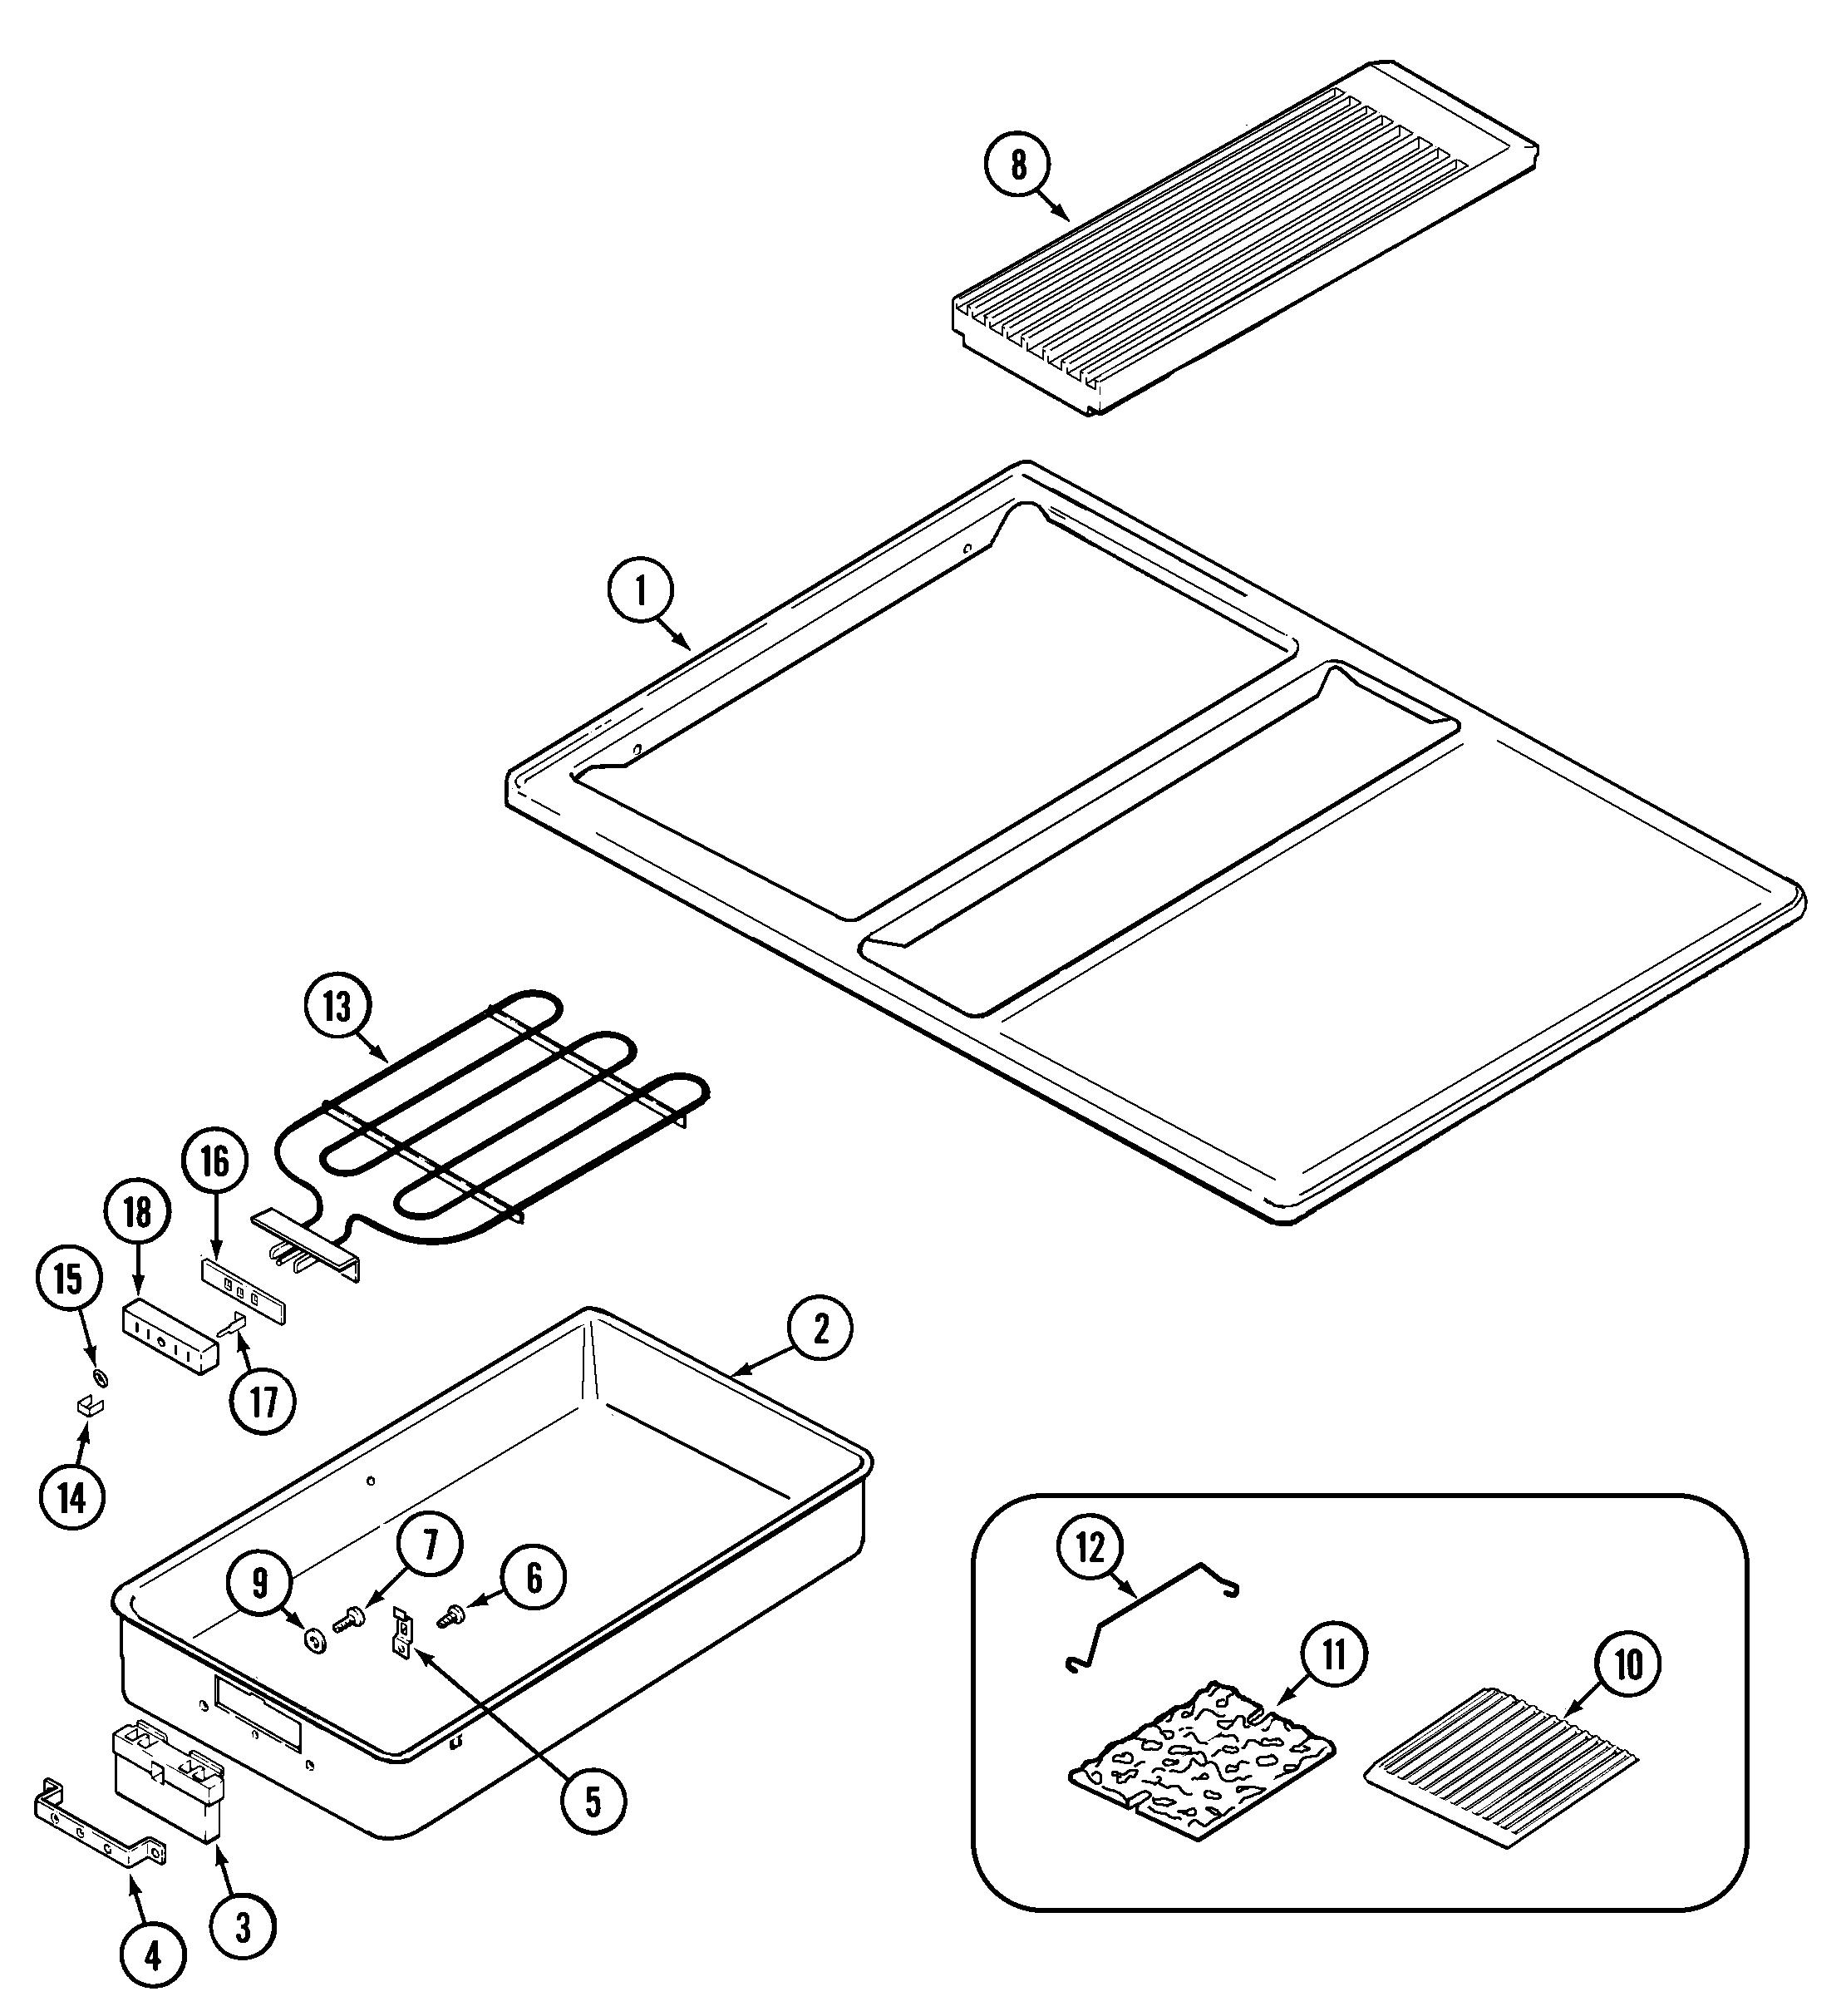 sve47100w electric slide-in range top assembly parts diagram